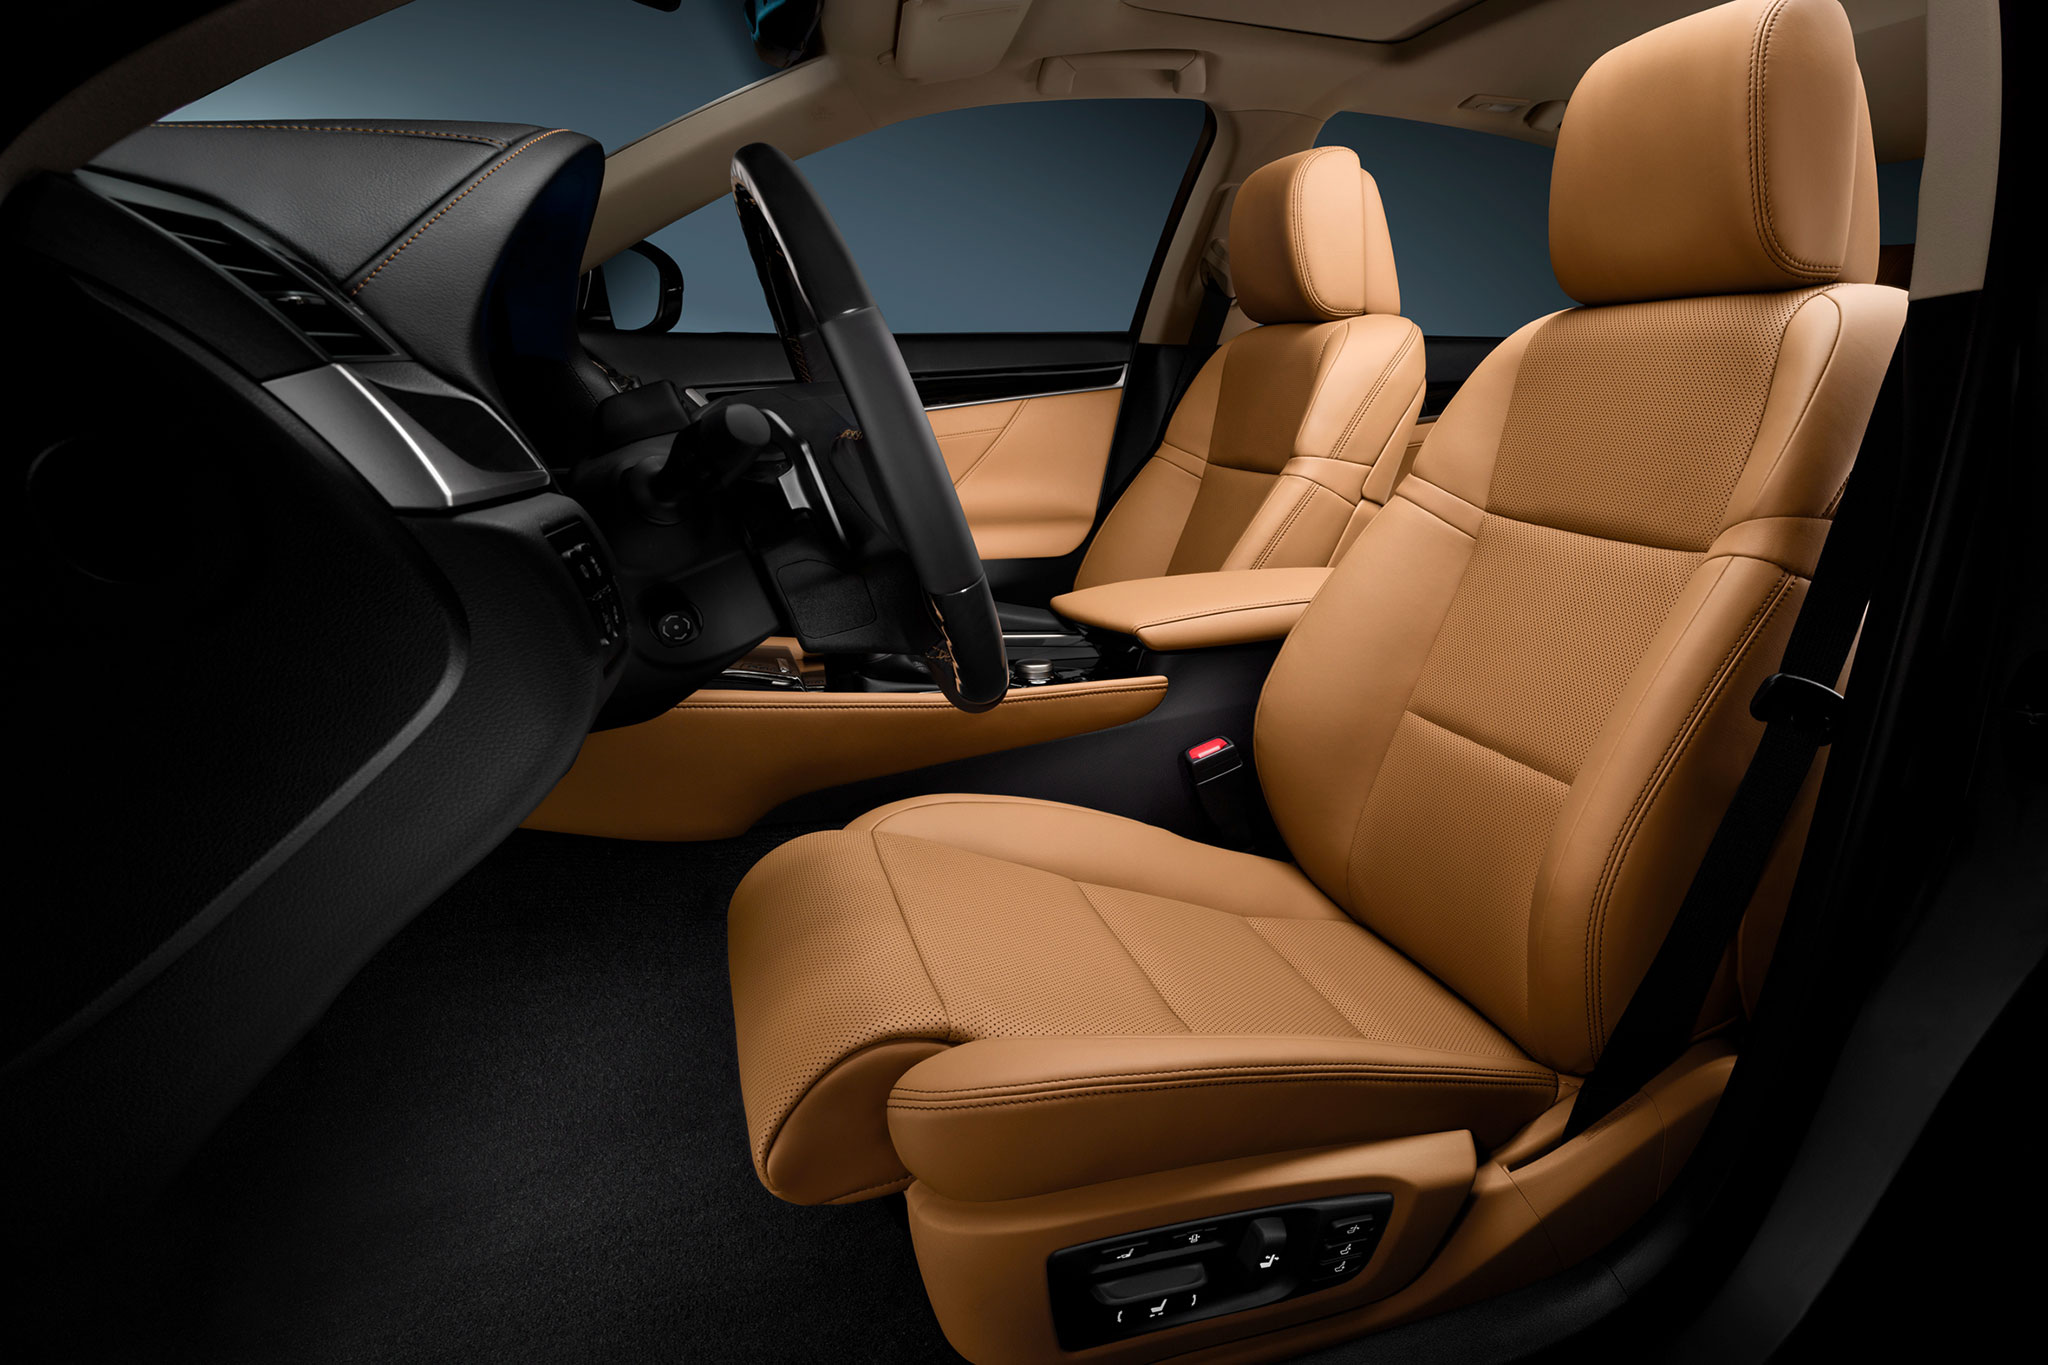 2013 Lexus GS 450h Price Remains $59 825 RX 350 F Sport IS Line